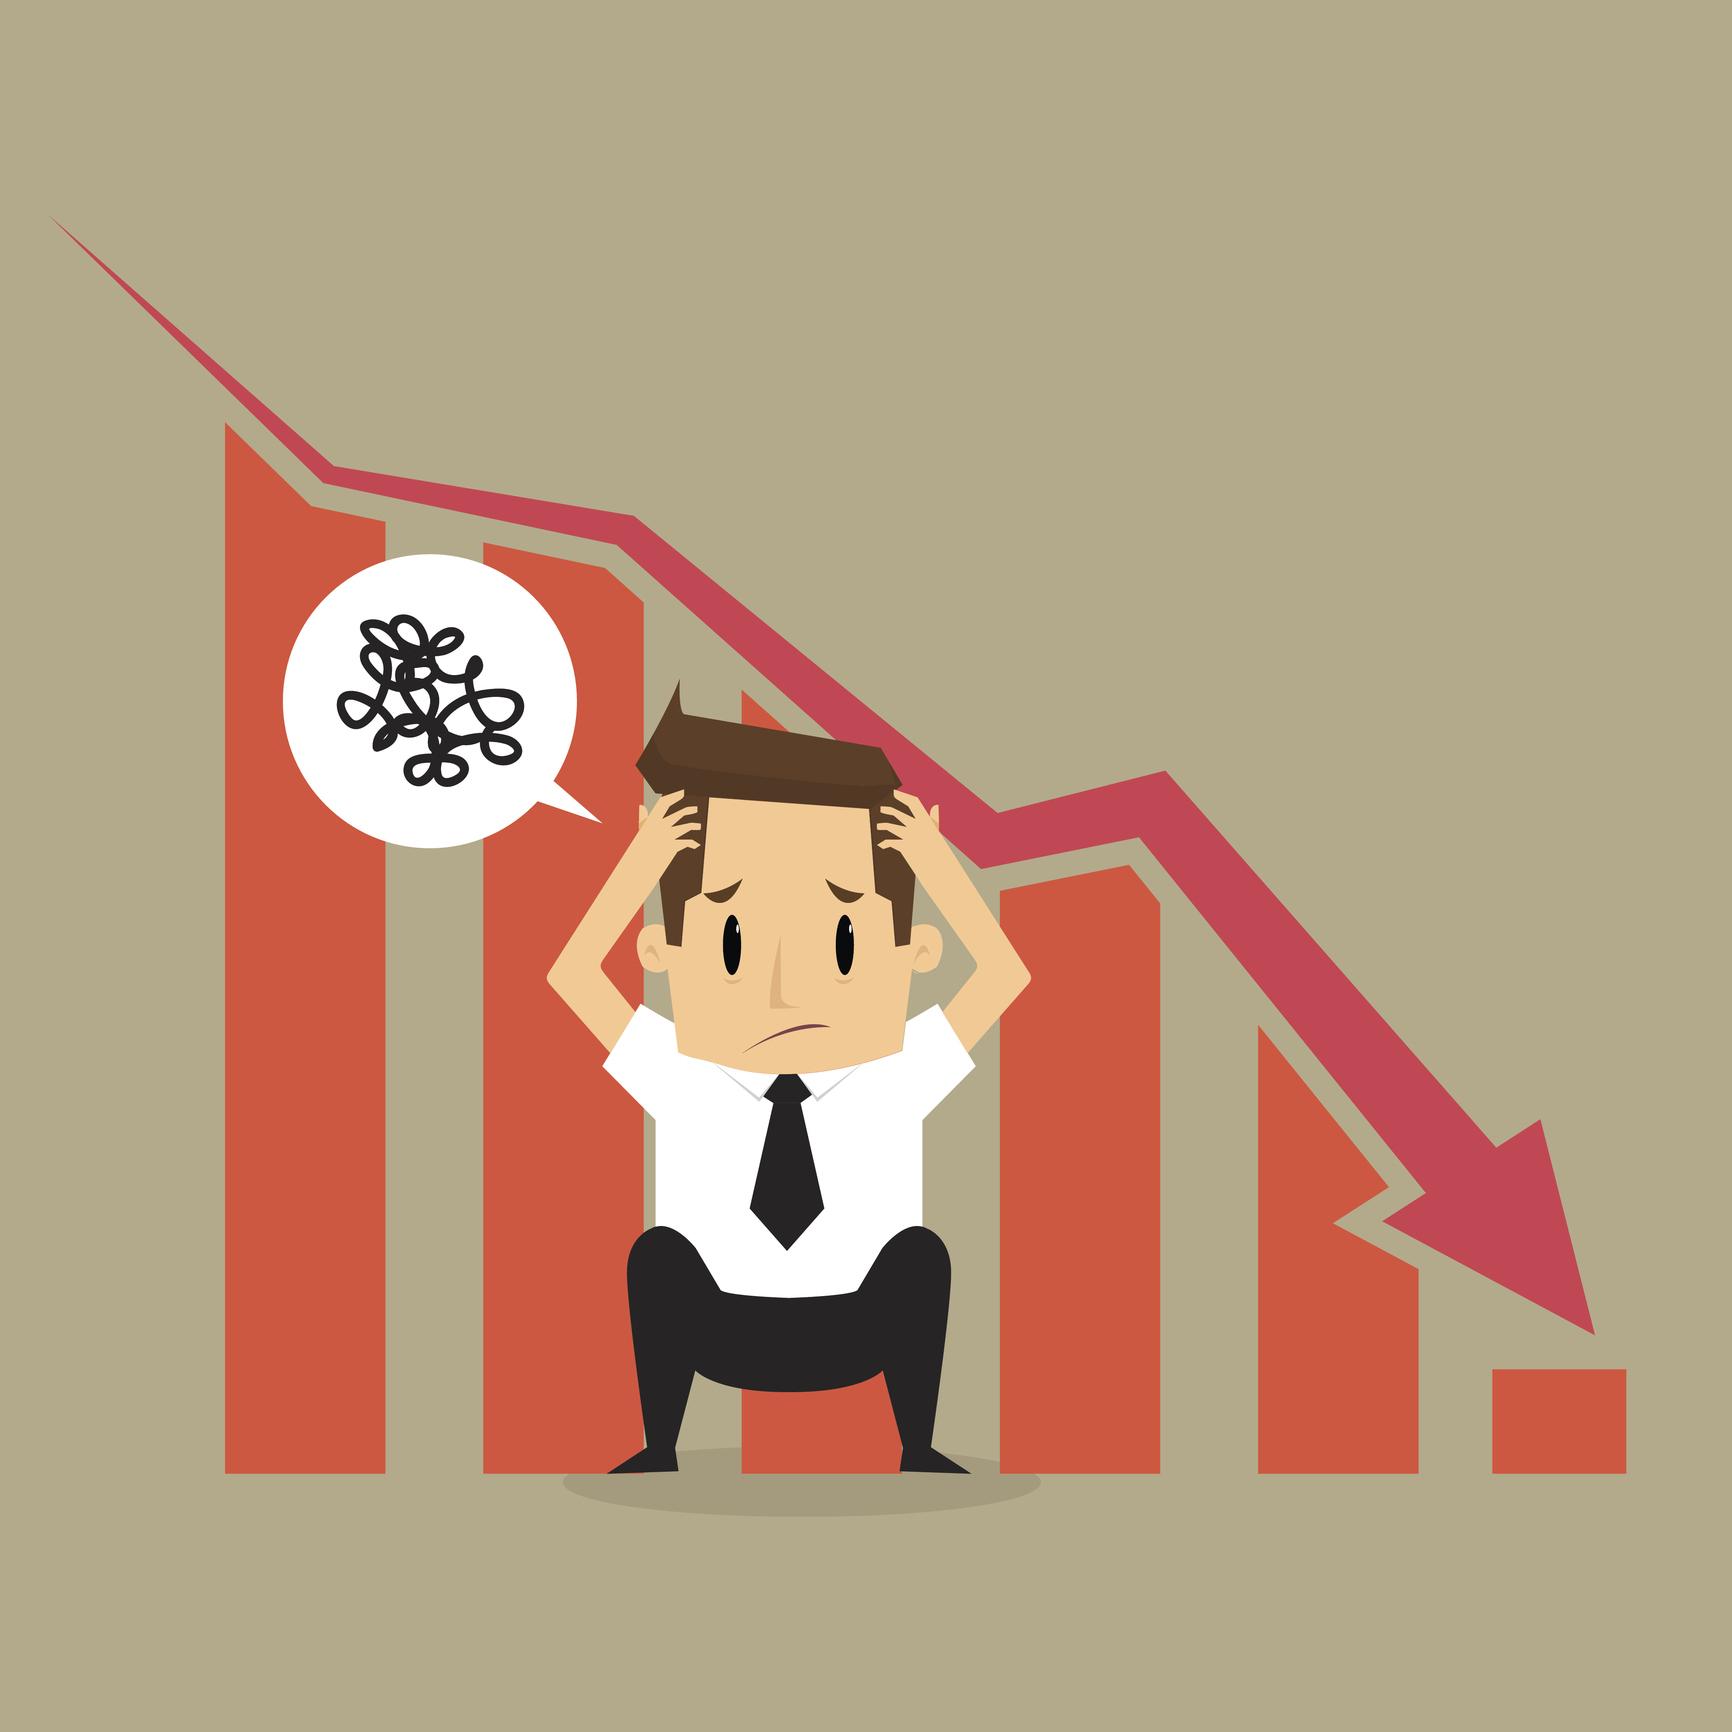 cartoon  broker nervous as graph behind him shows market crash.